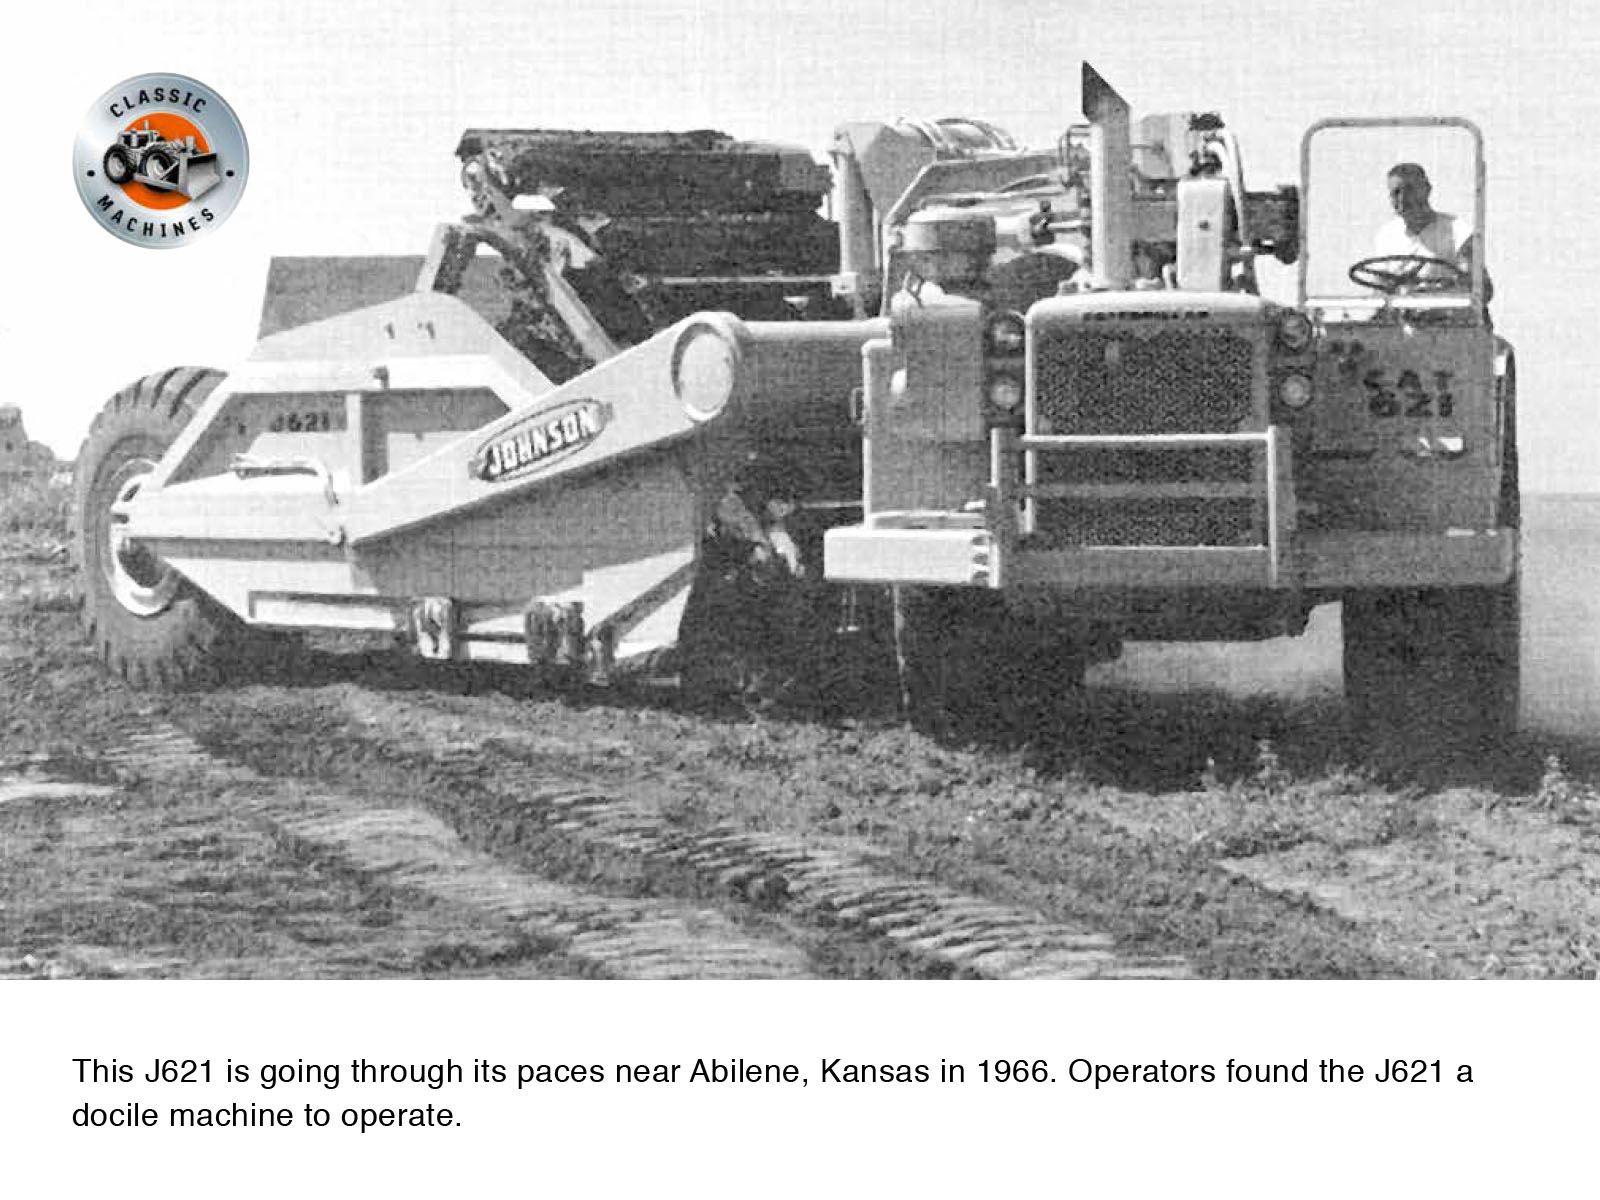 Putting the J621 through its paces near Abilene, Texas.